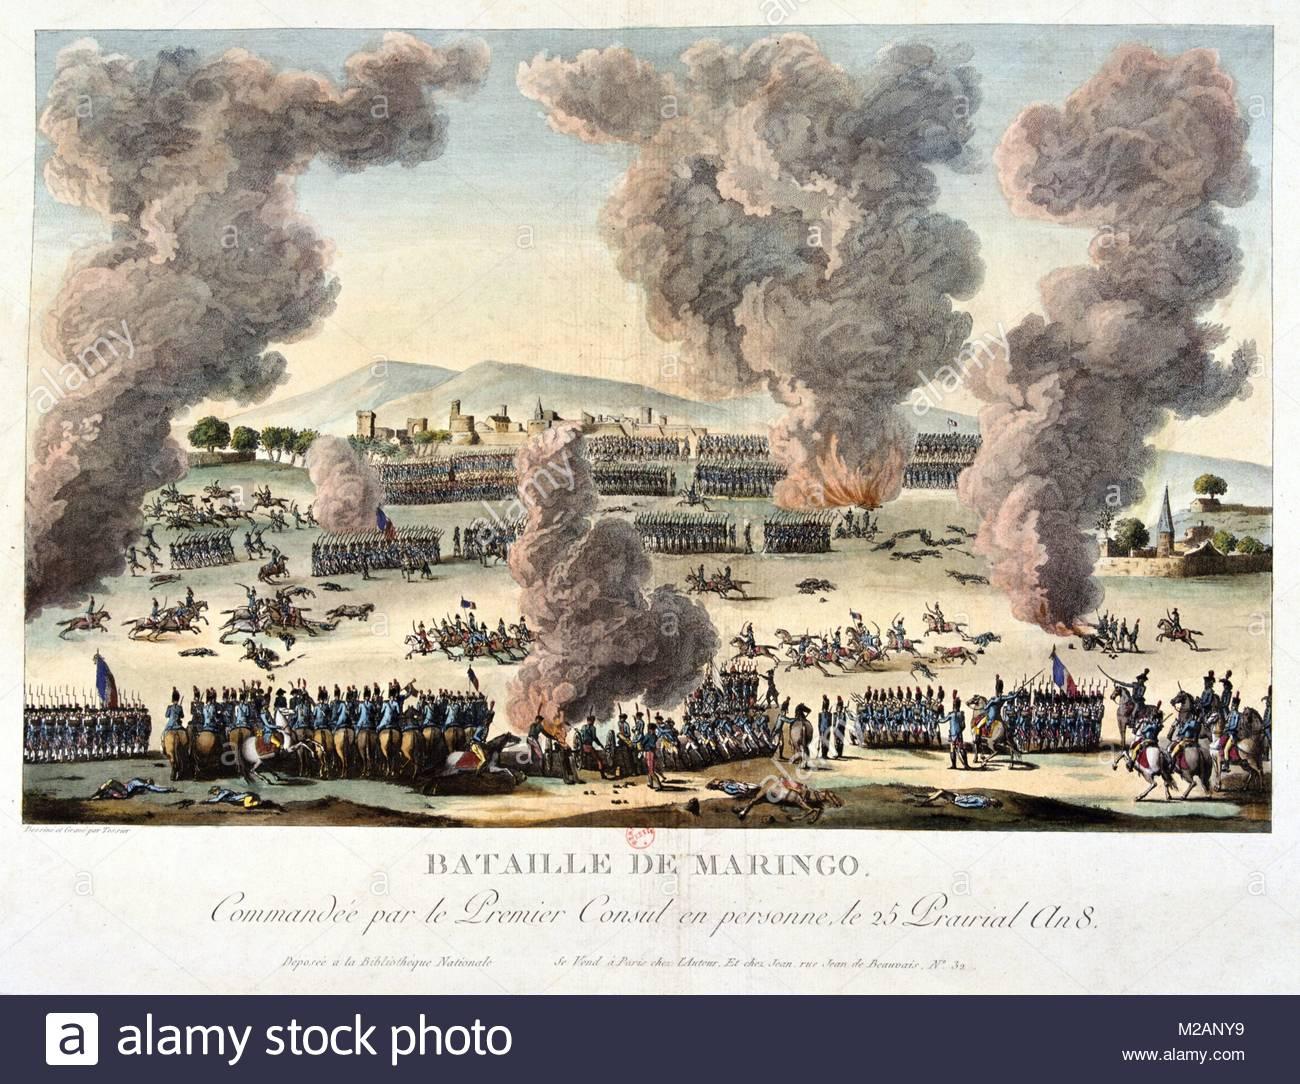 The Battle of Marengo, 14 June 1800 - Stock Image